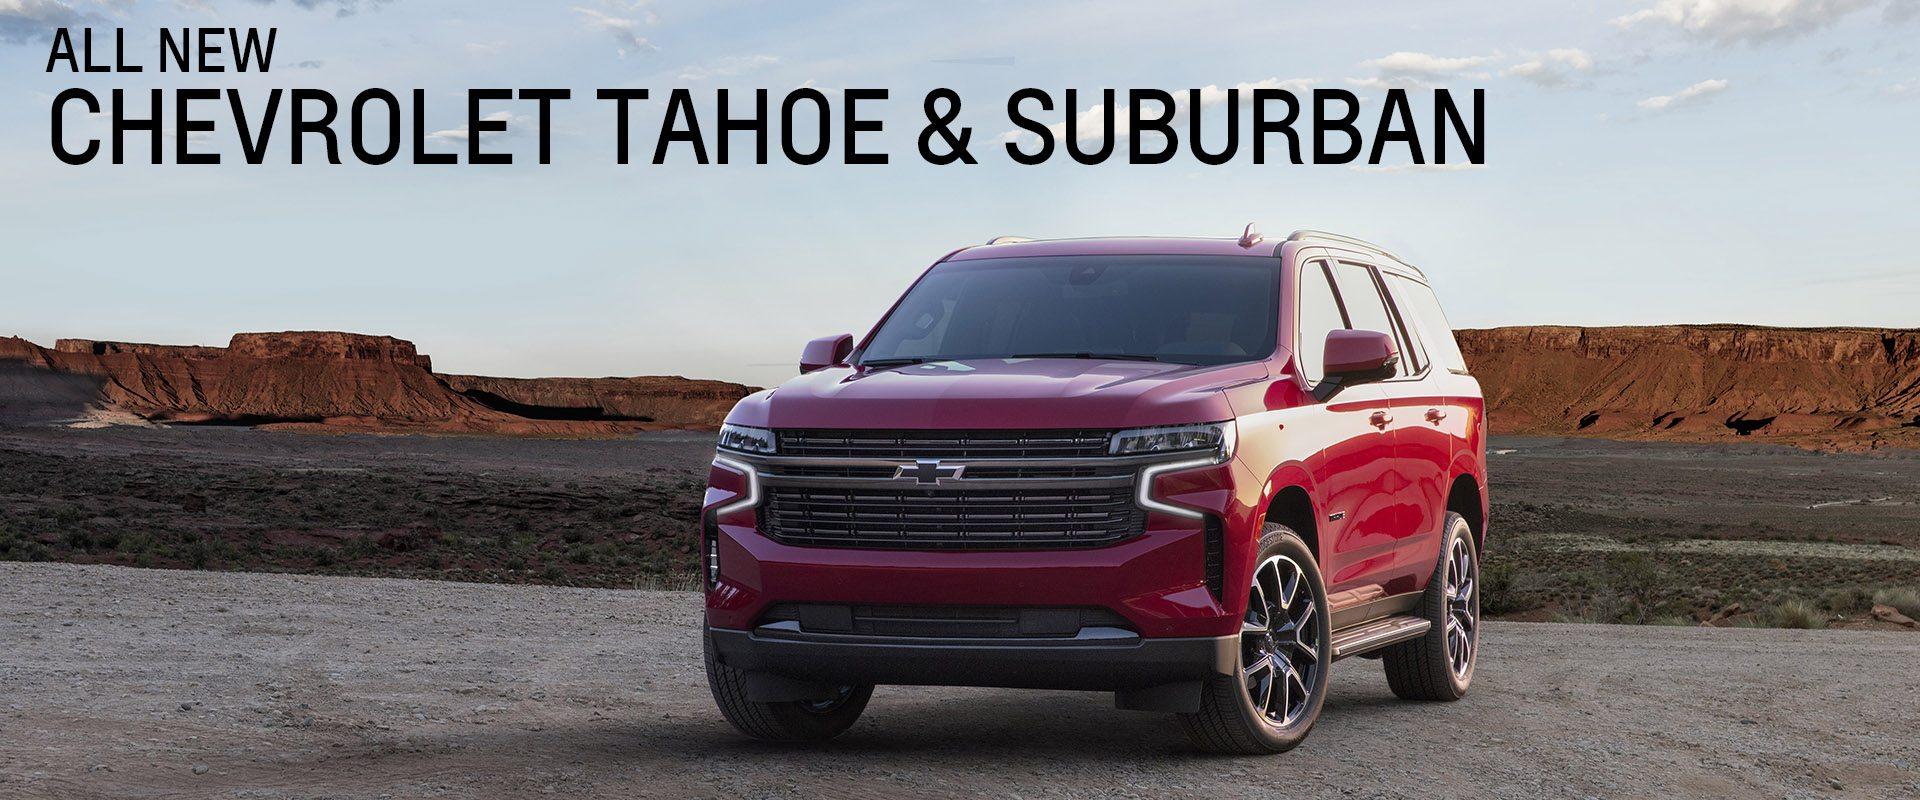 2021 Chevrolet Tahoe/Suburban